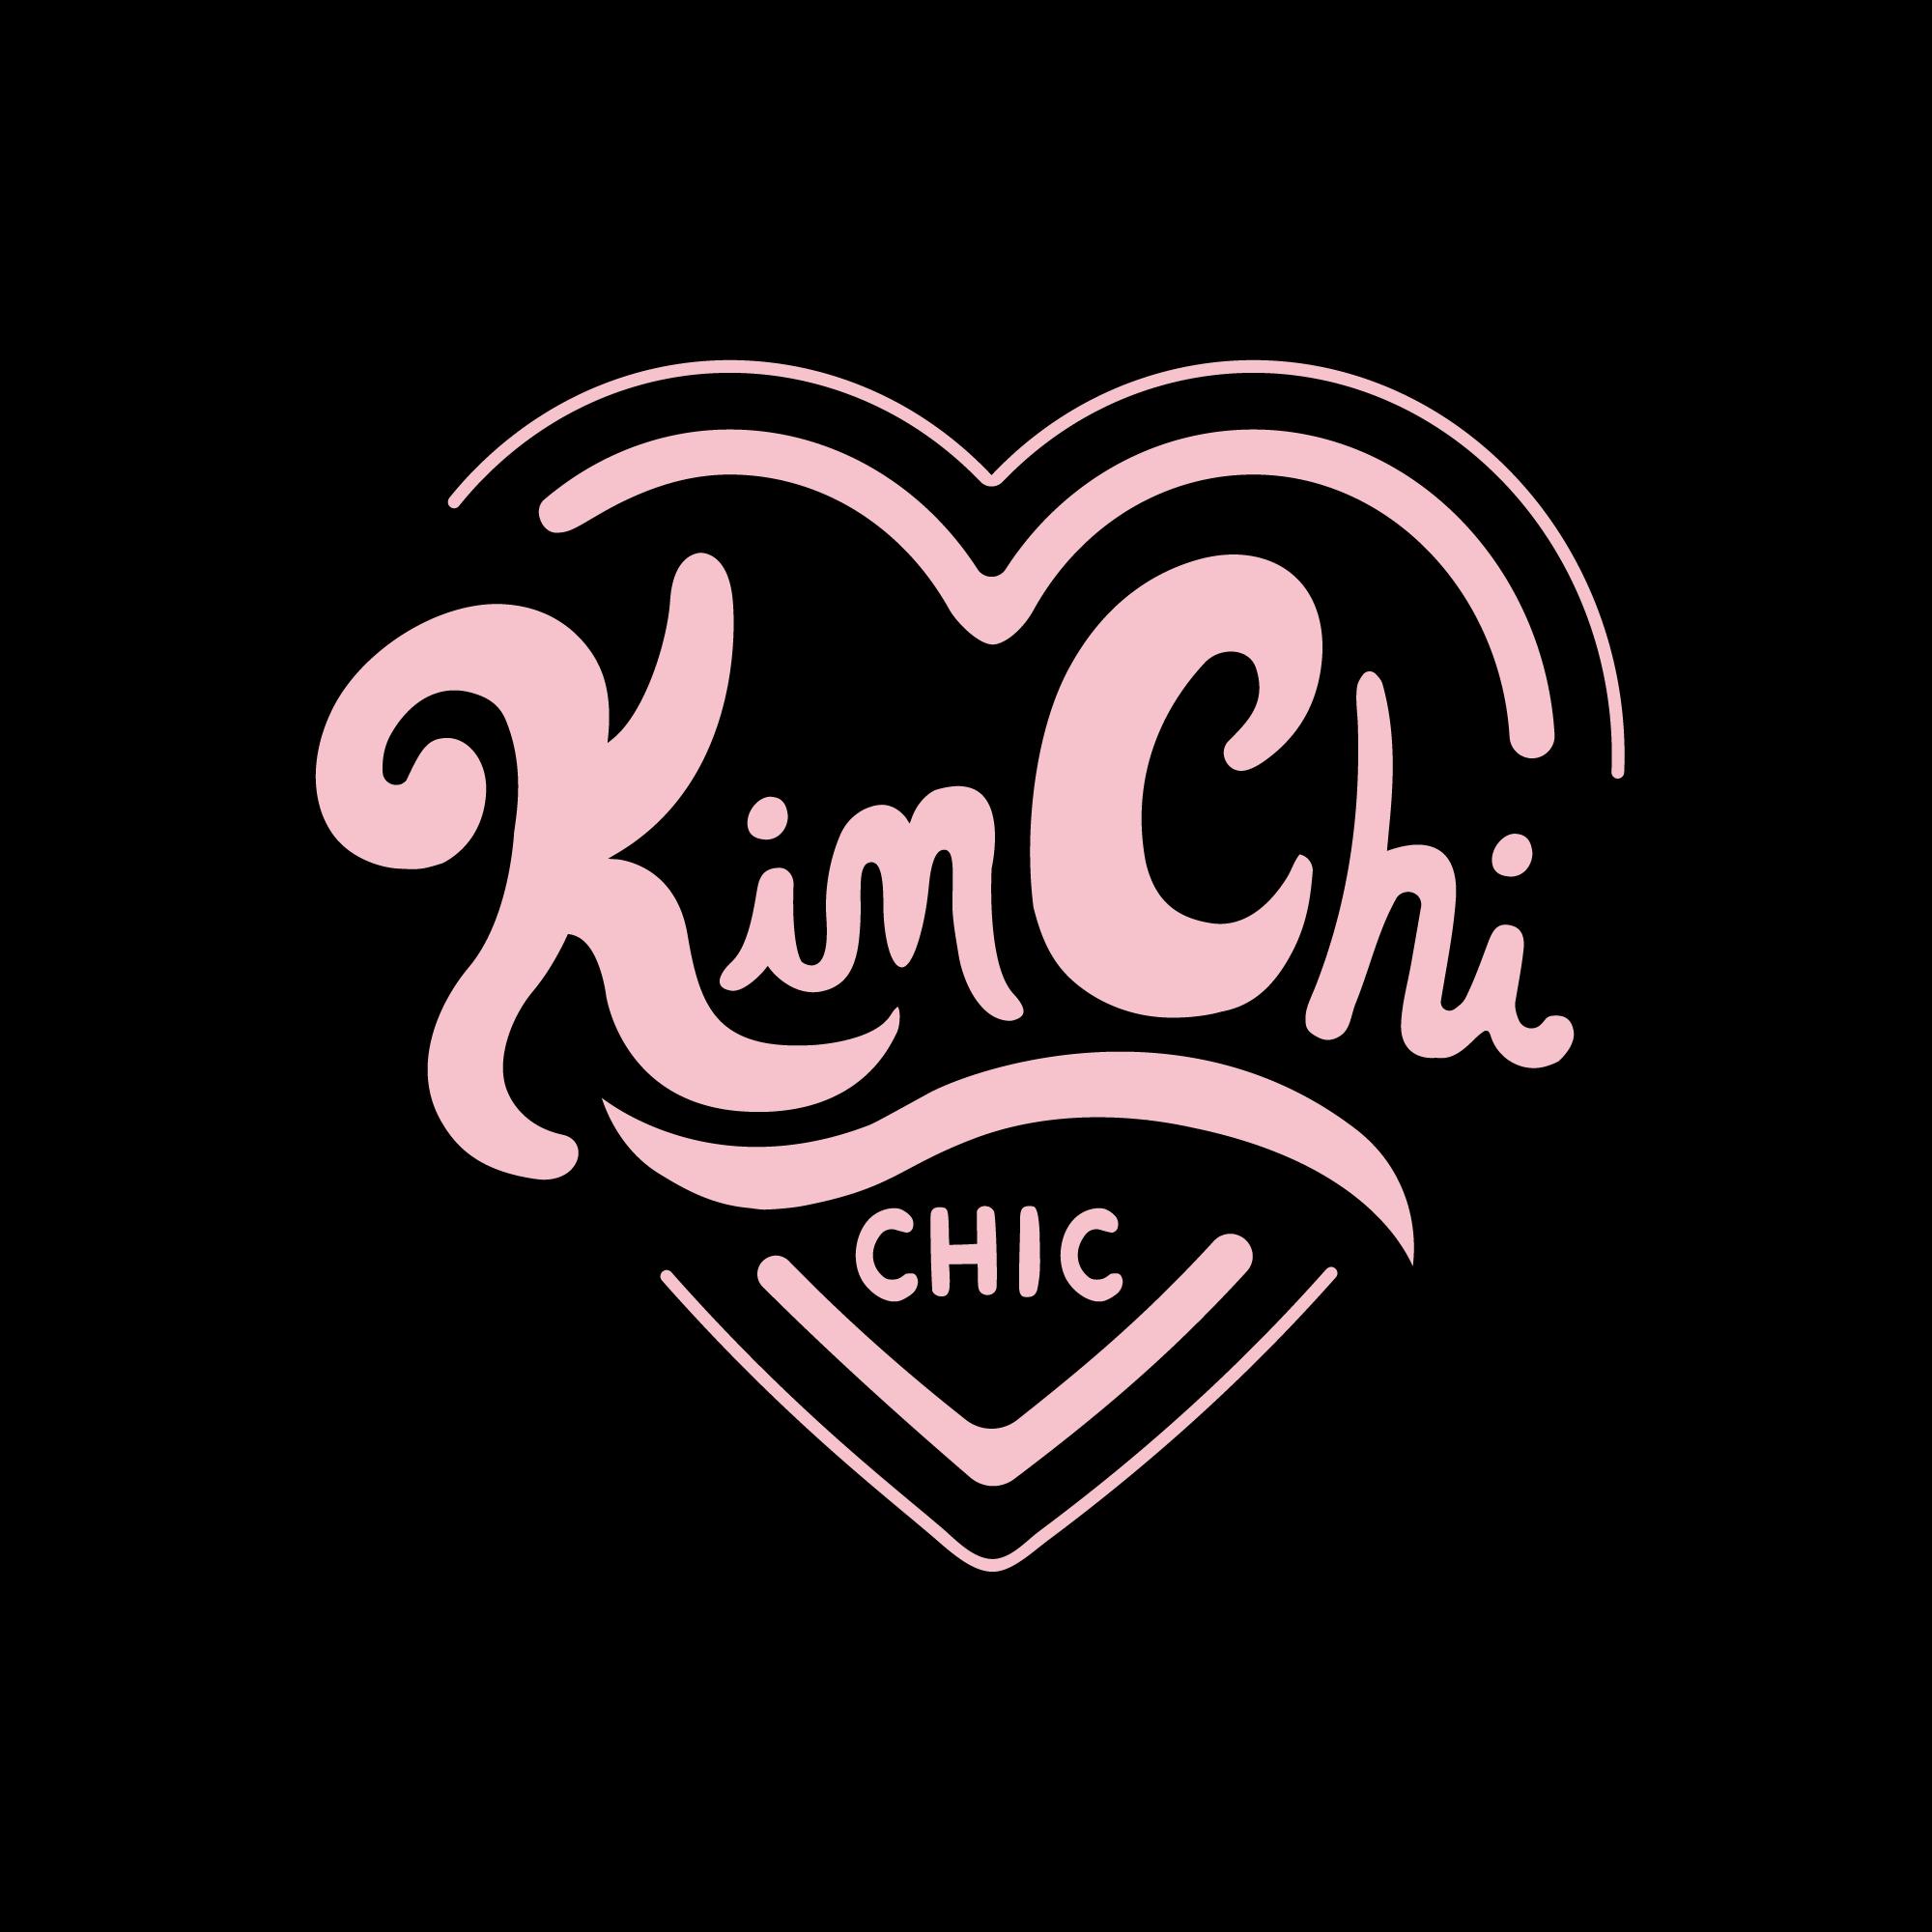 KimChi Chic